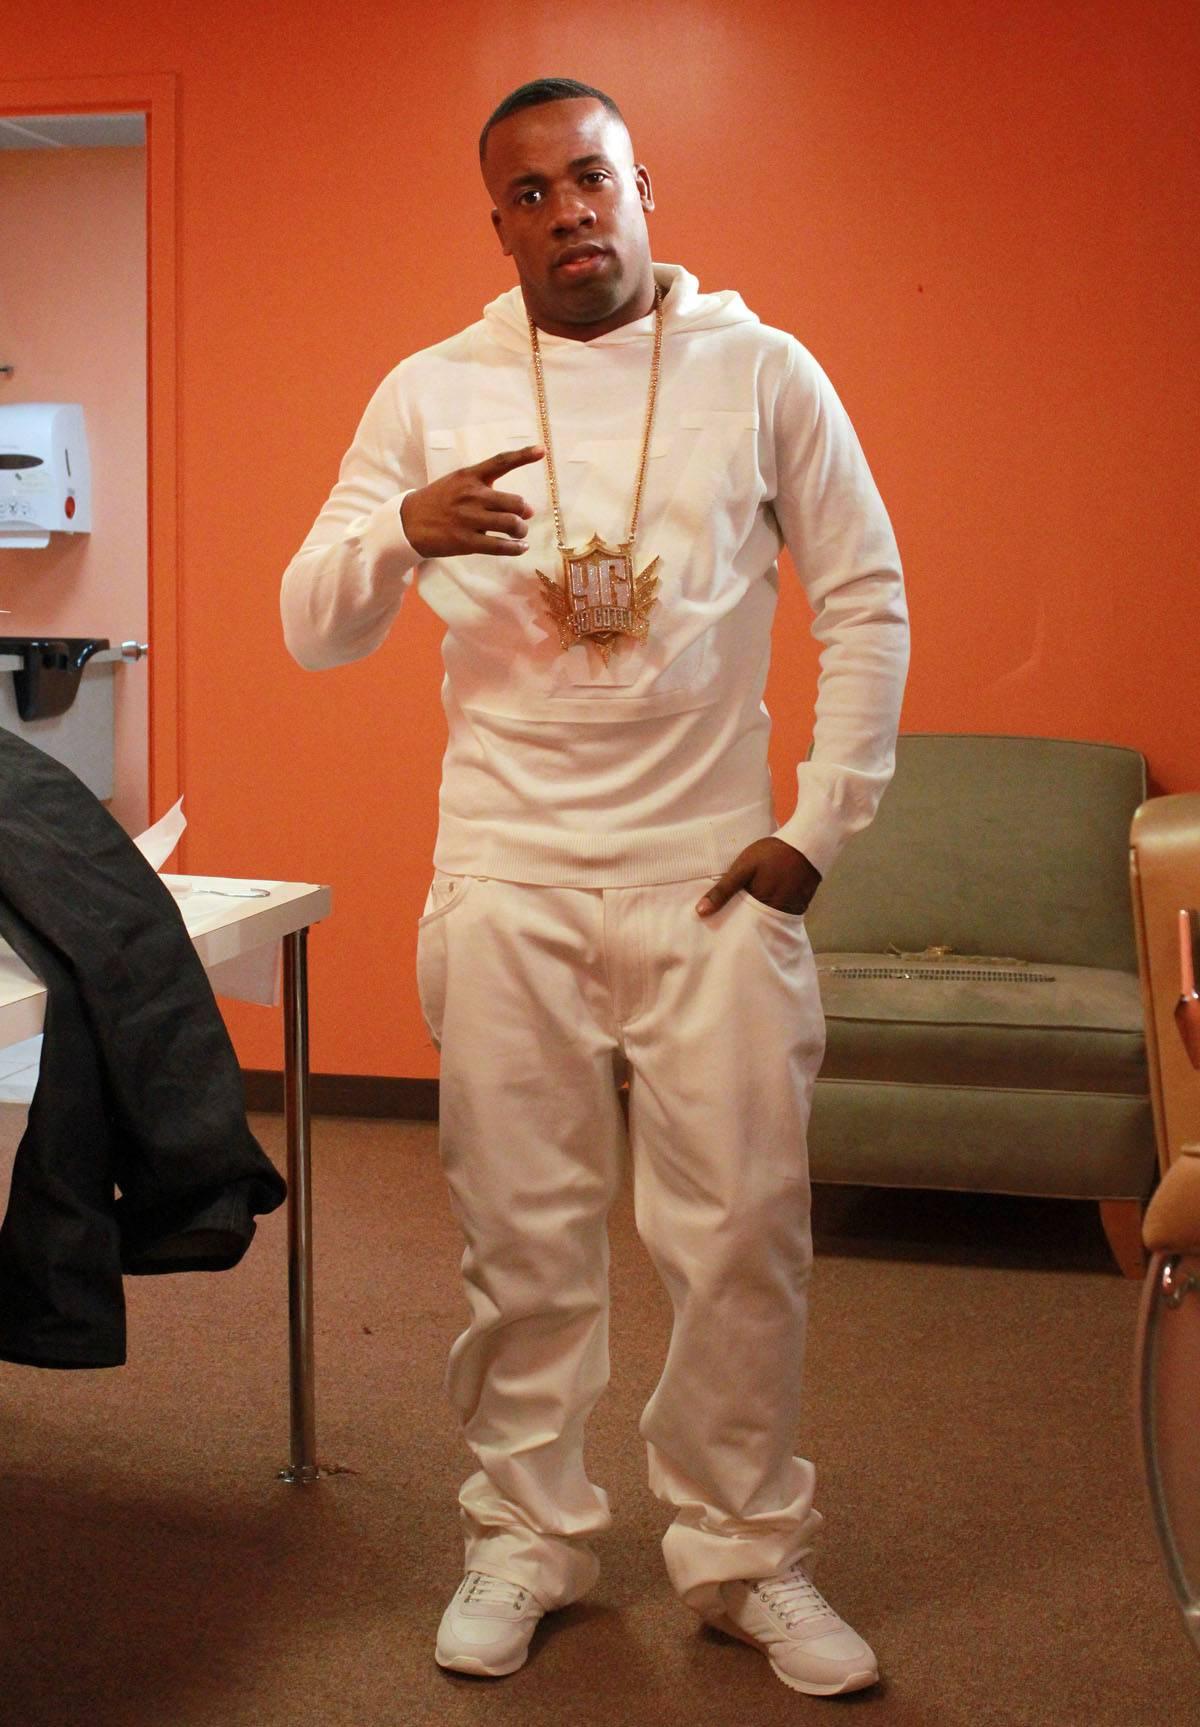 Cop My Album - Yo Gotti on set at 106 & Park. (photo by: Slim)